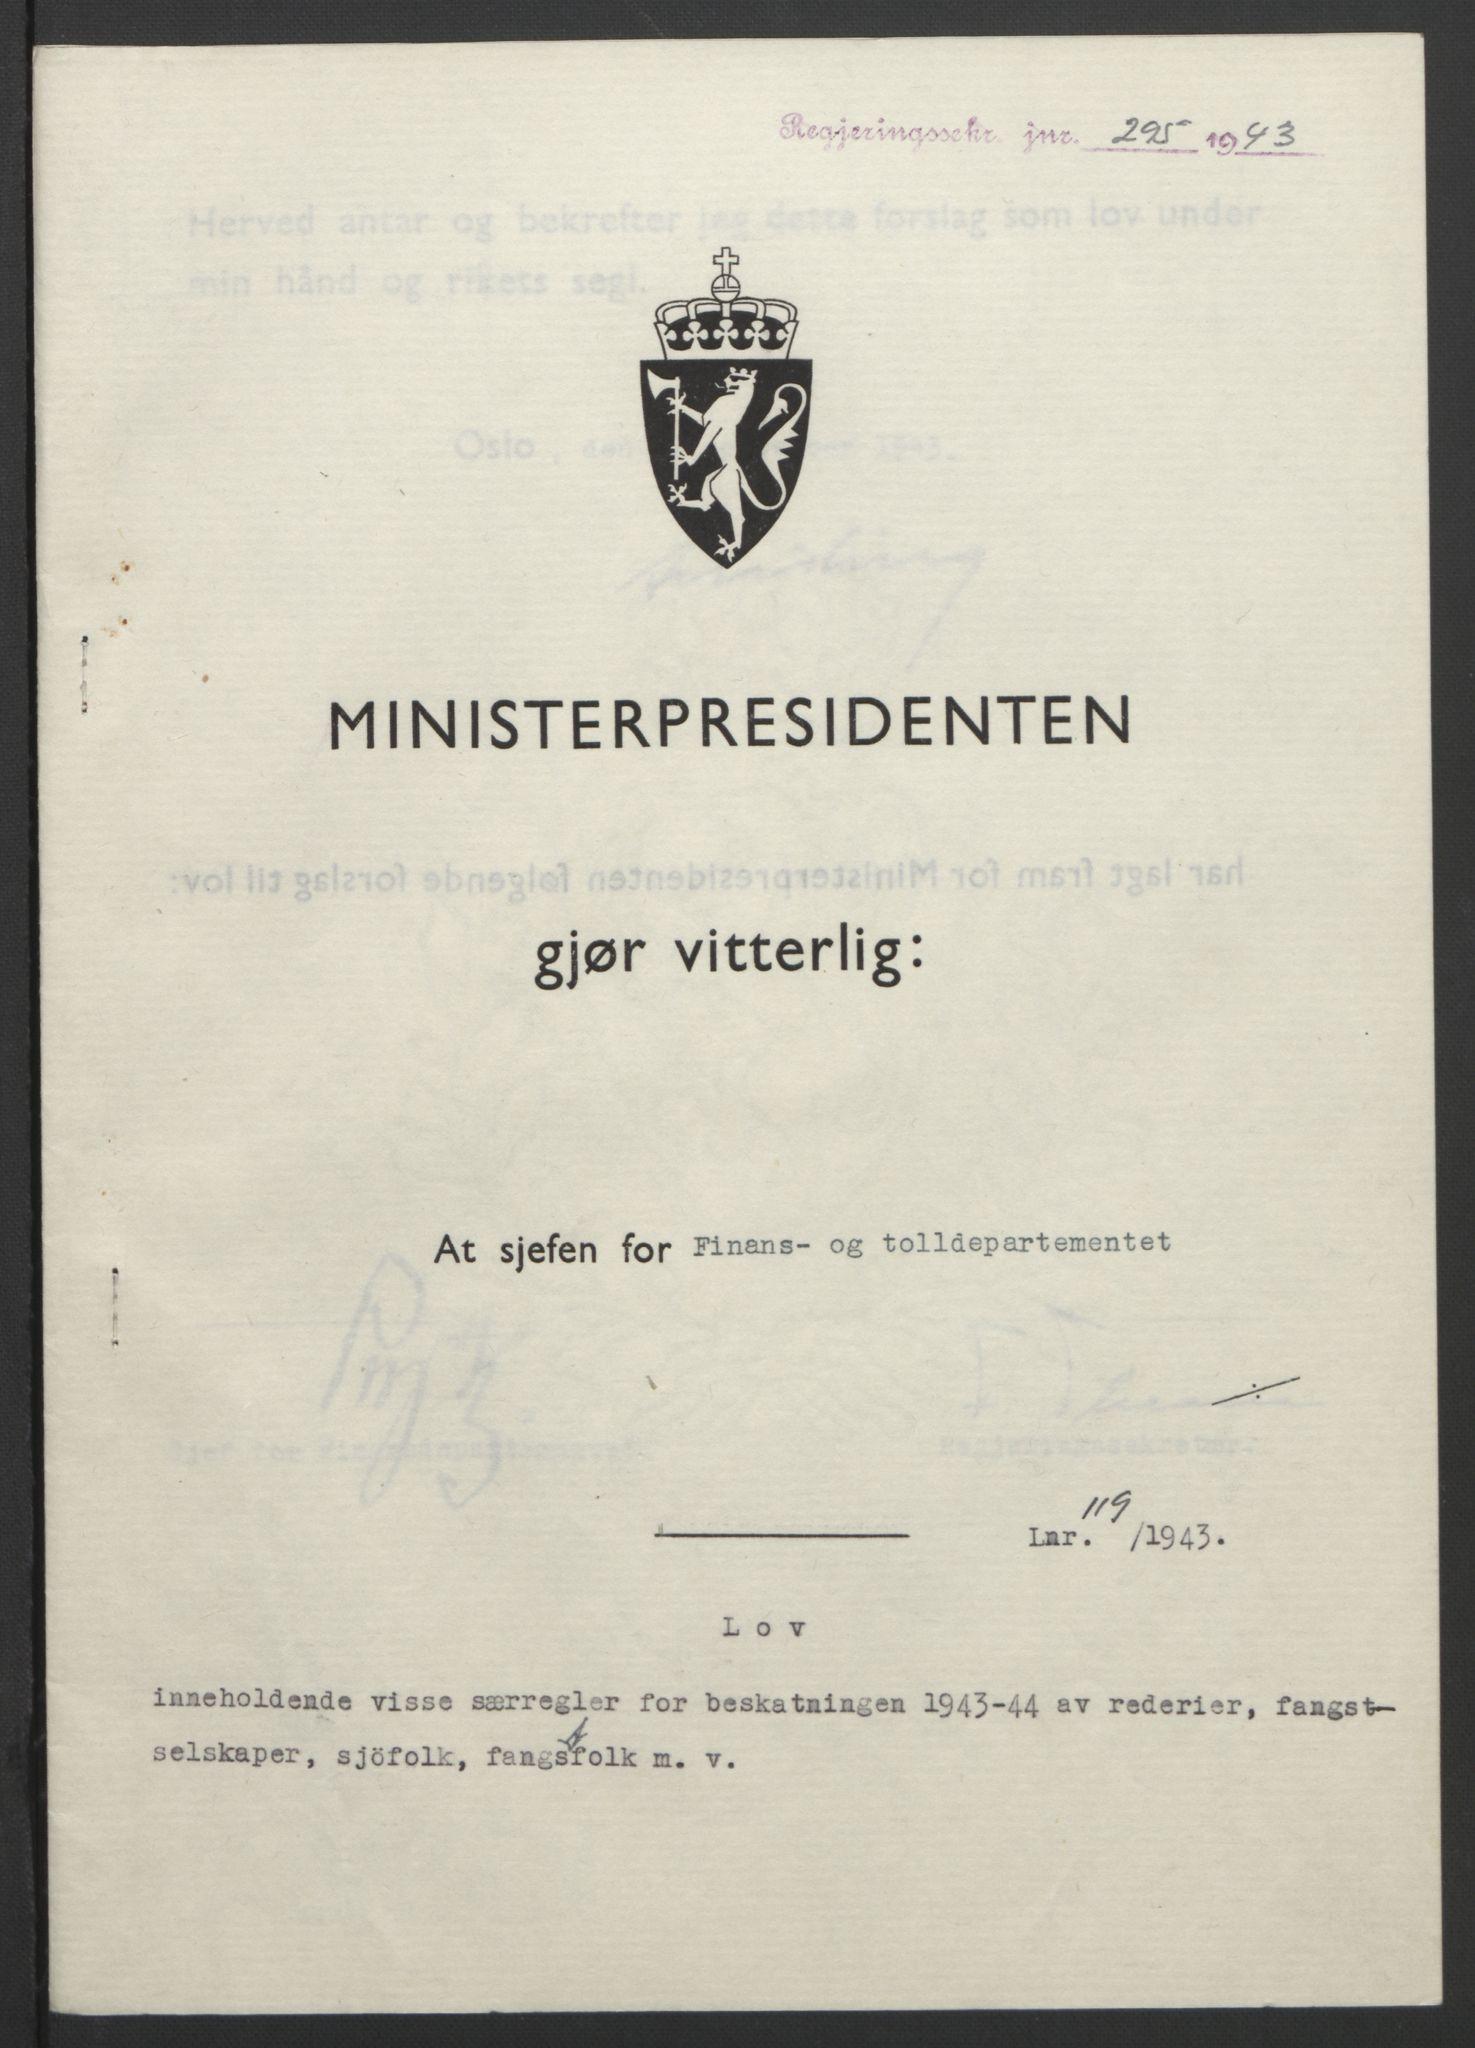 RA, NS-administrasjonen 1940-1945 (Statsrådsekretariatet, de kommisariske statsråder mm), D/Db/L0099: Lover, 1943, s. 552